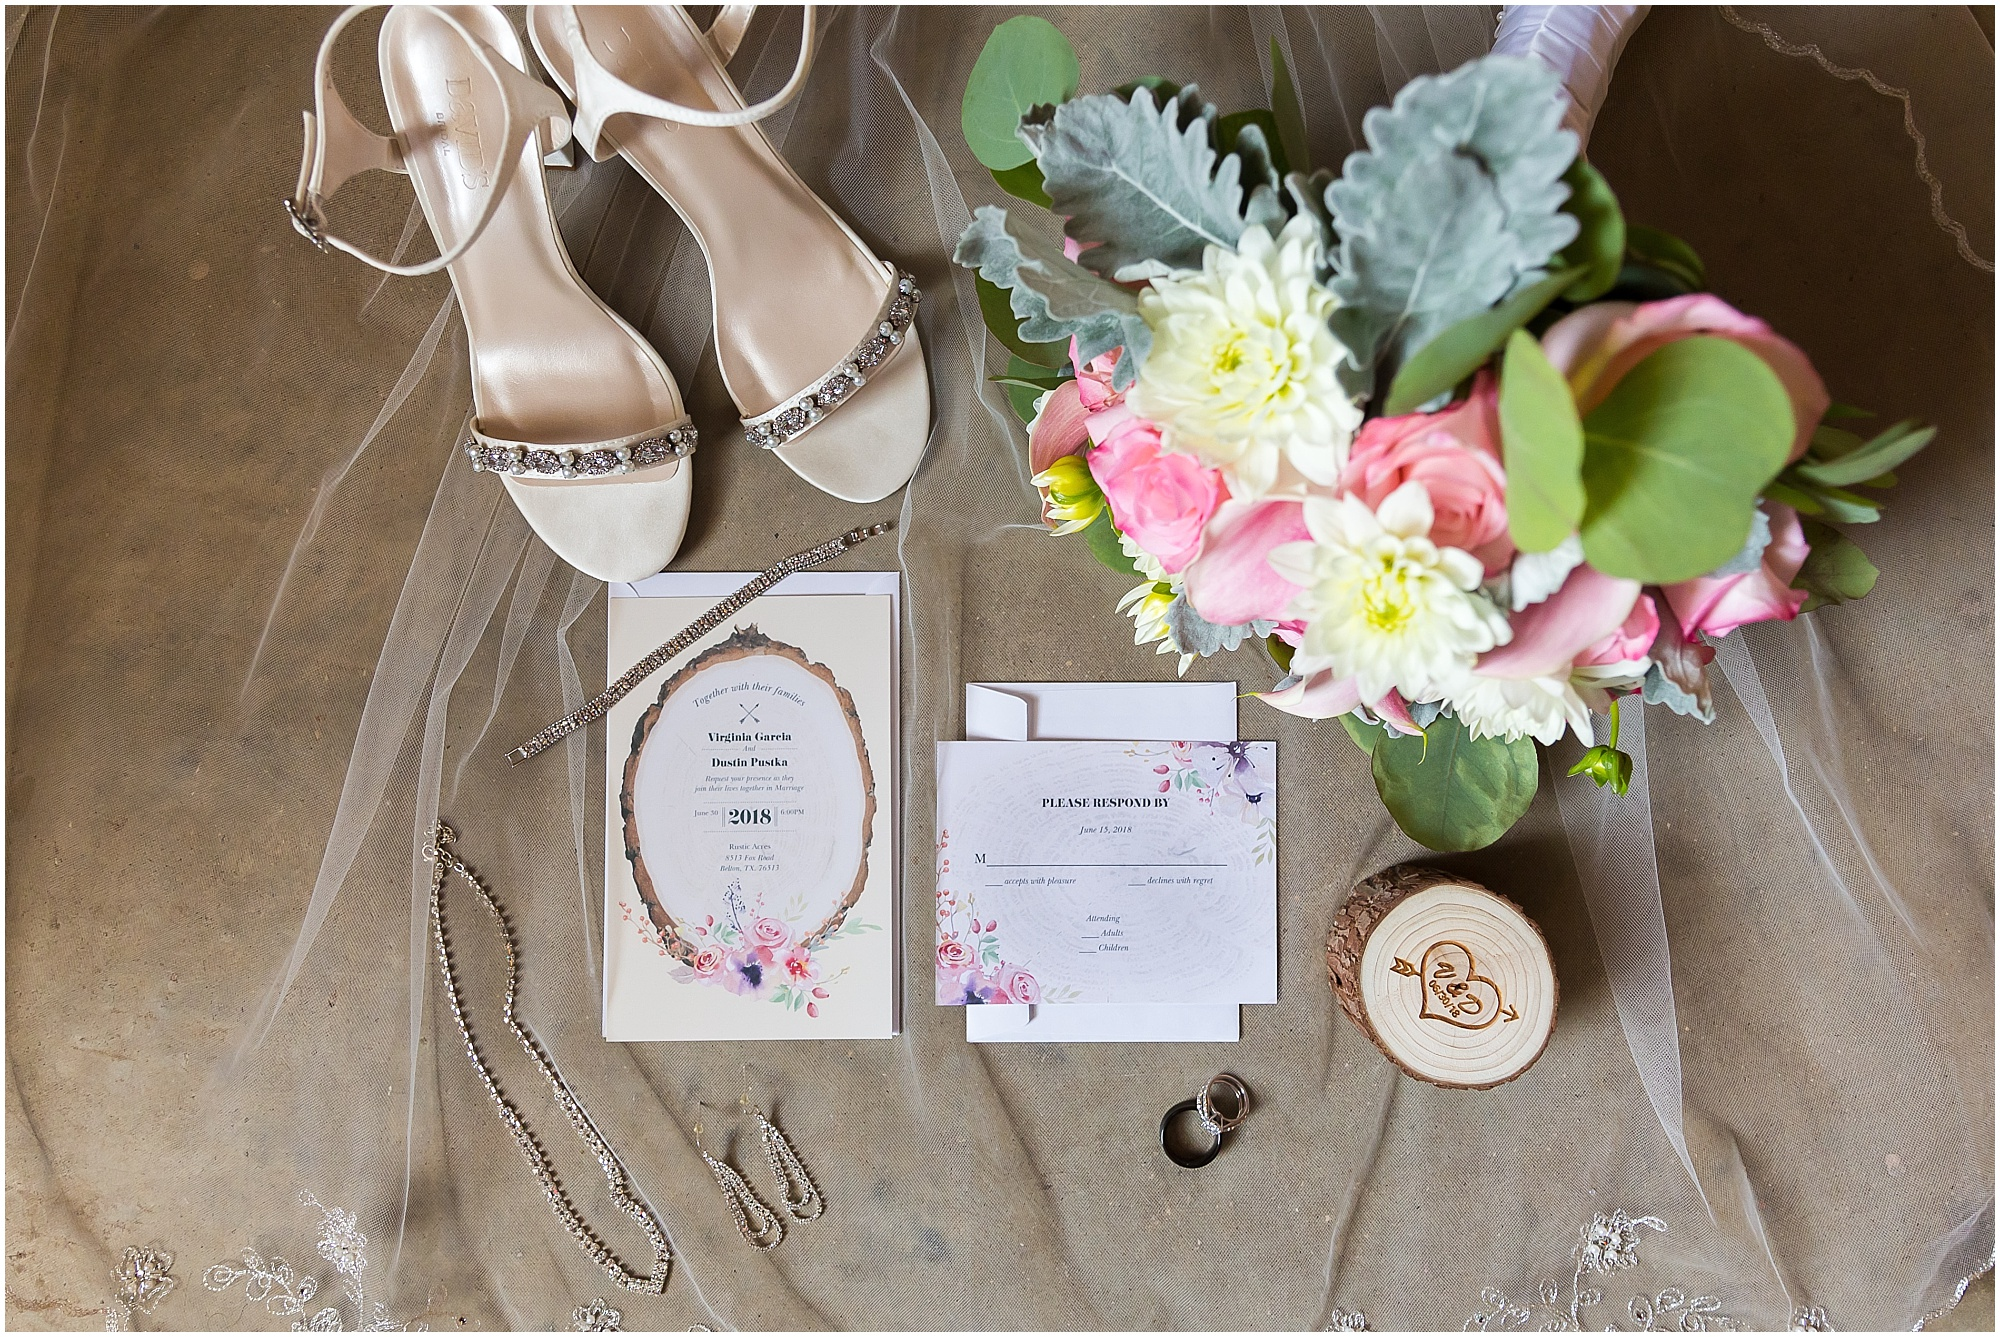 Bridal details from a rustic wedding in Belton, Texas - Jason & Melaina Photography - www.jasonandmelaina.com